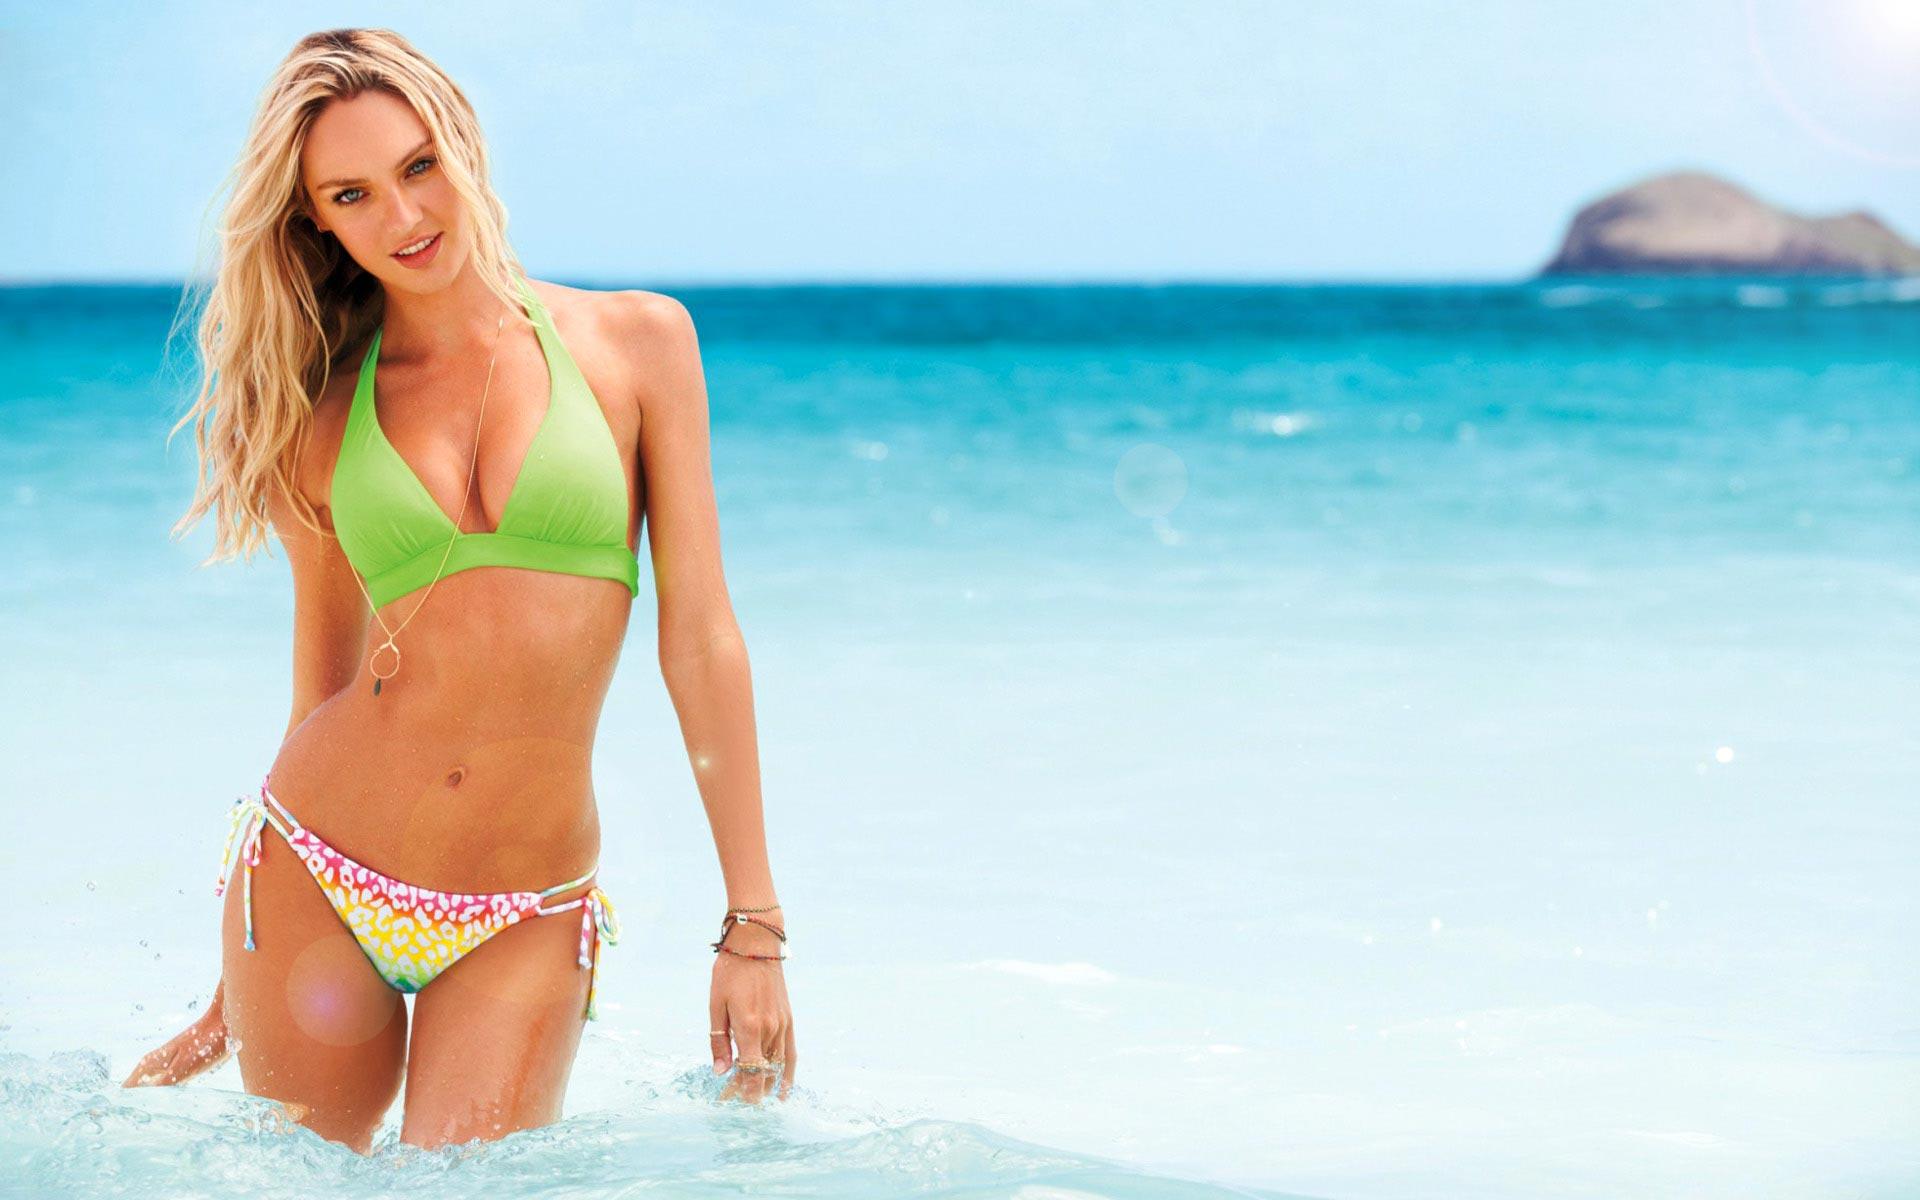 Candice Swanepoel   Candice Swanepoel Wallpaper Bikini   1920x1200 1920x1200